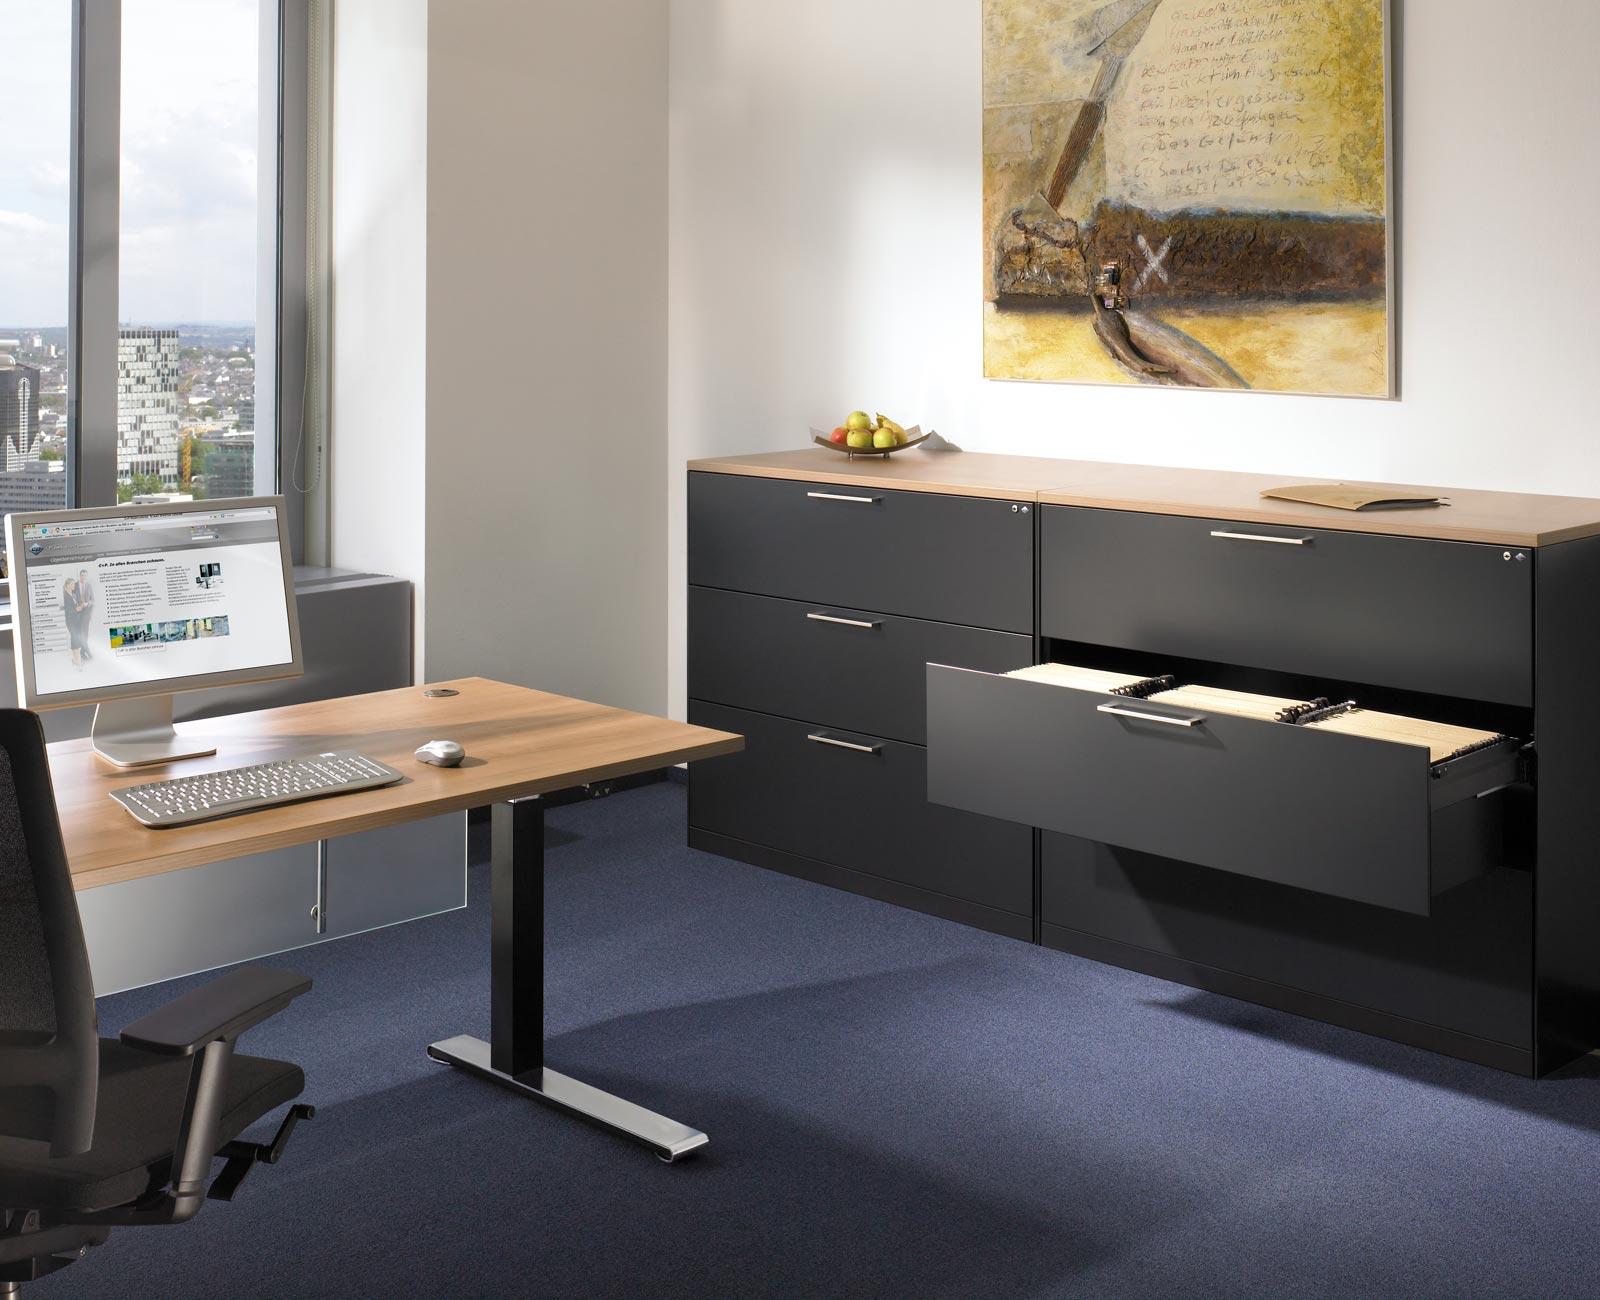 karteischrank b rom bel blog und ratgeber. Black Bedroom Furniture Sets. Home Design Ideas